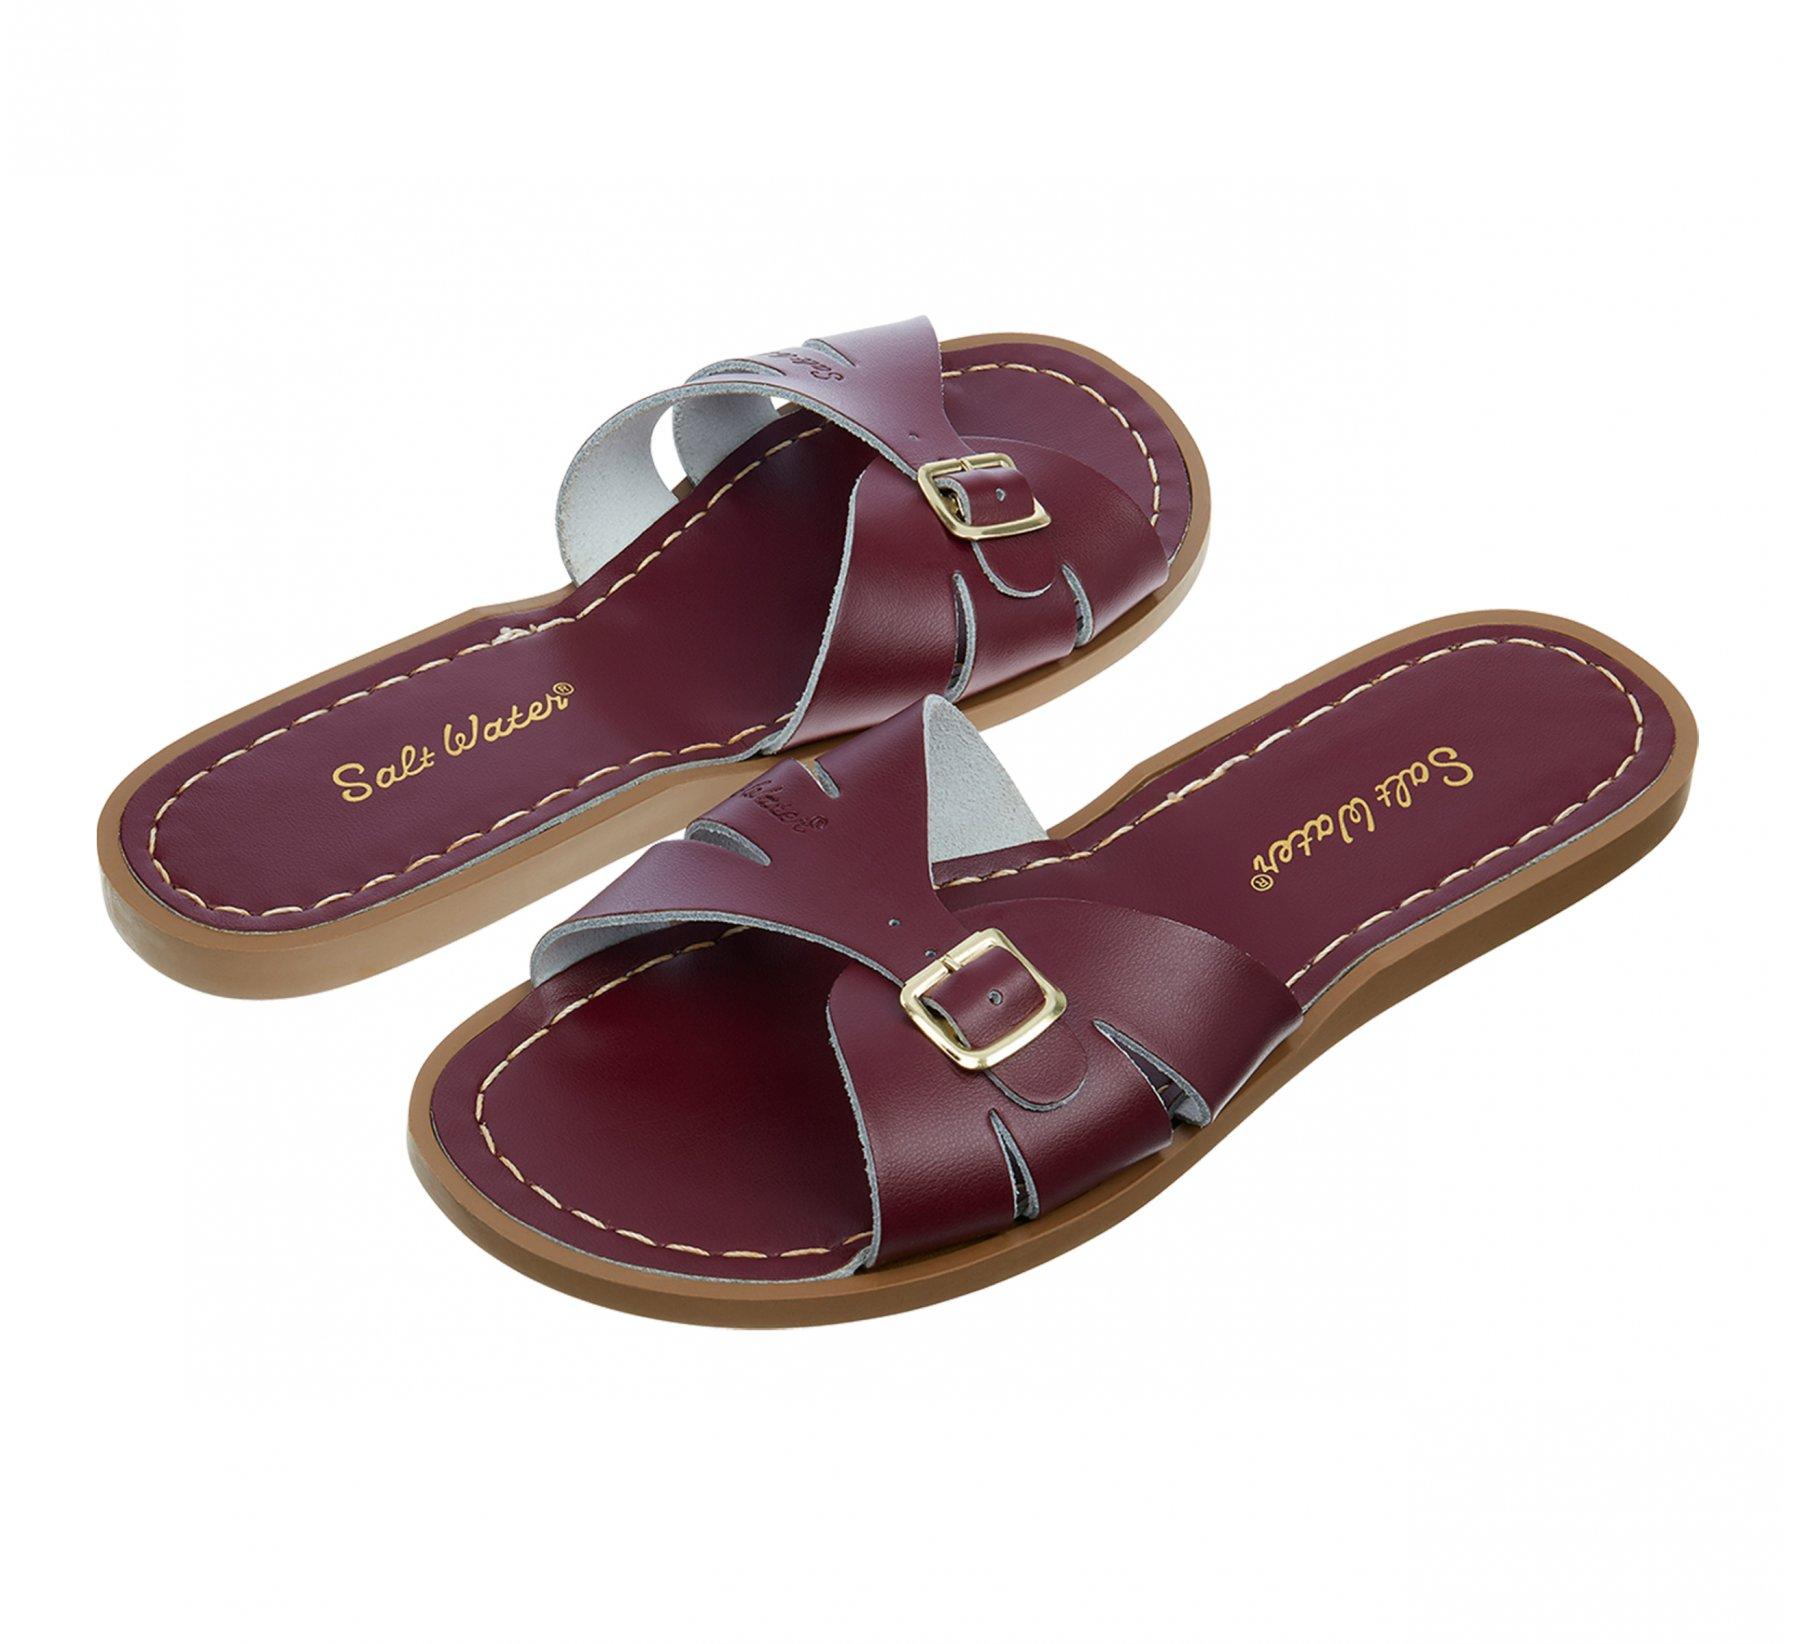 Classic Slide Claret - Salt Water Sandals